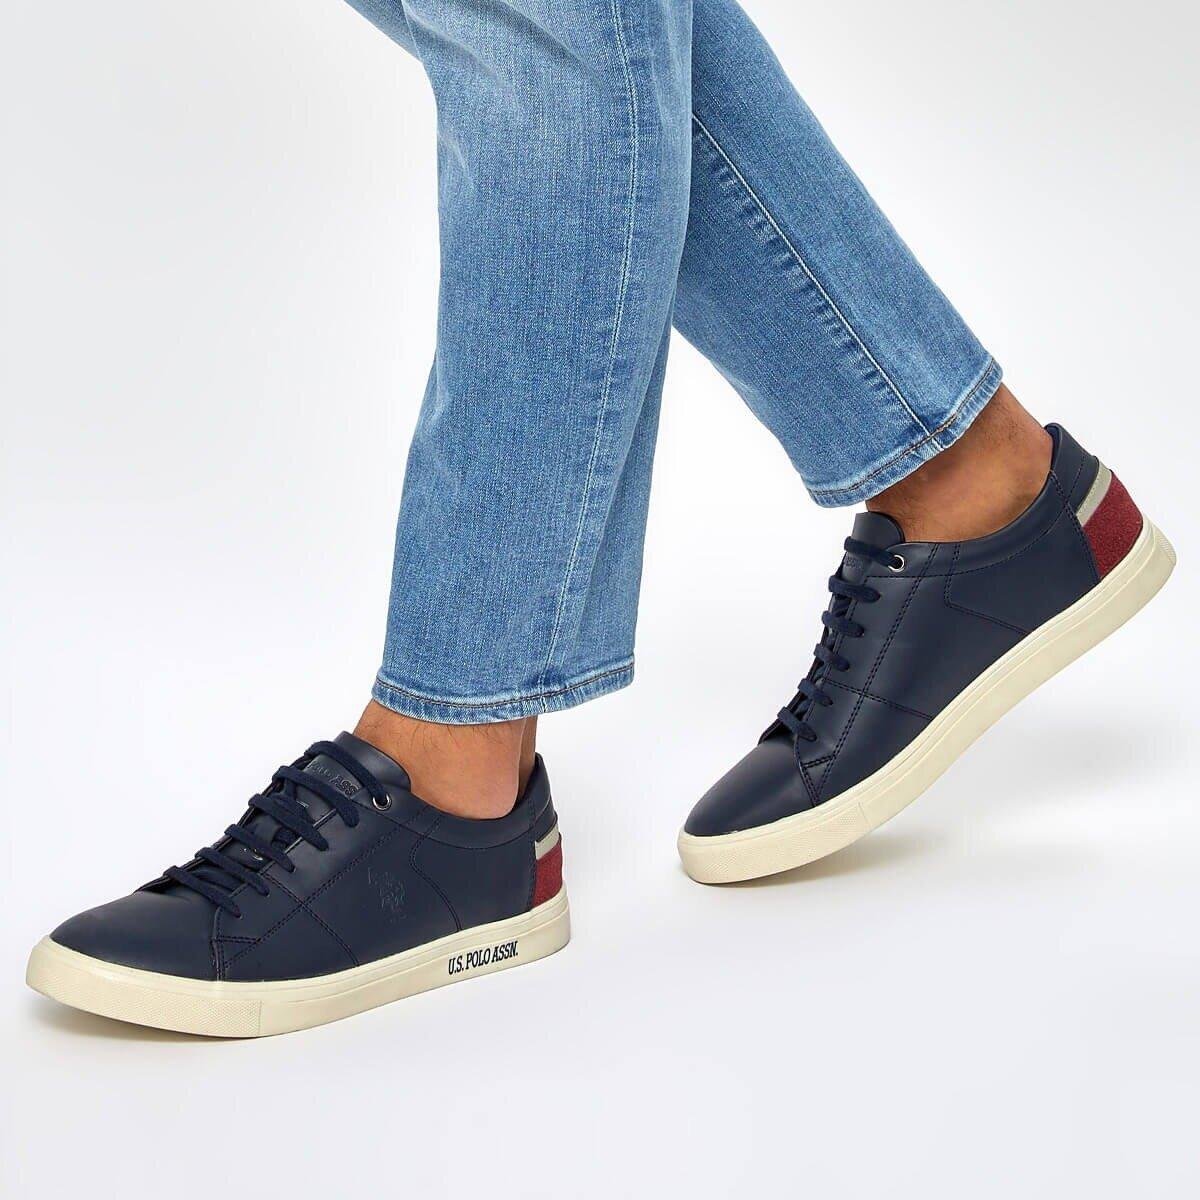 FLO SCOTT WT 9PR Navy Blue Men 'S Sneaker Shoes U.S. POLO ASSN.